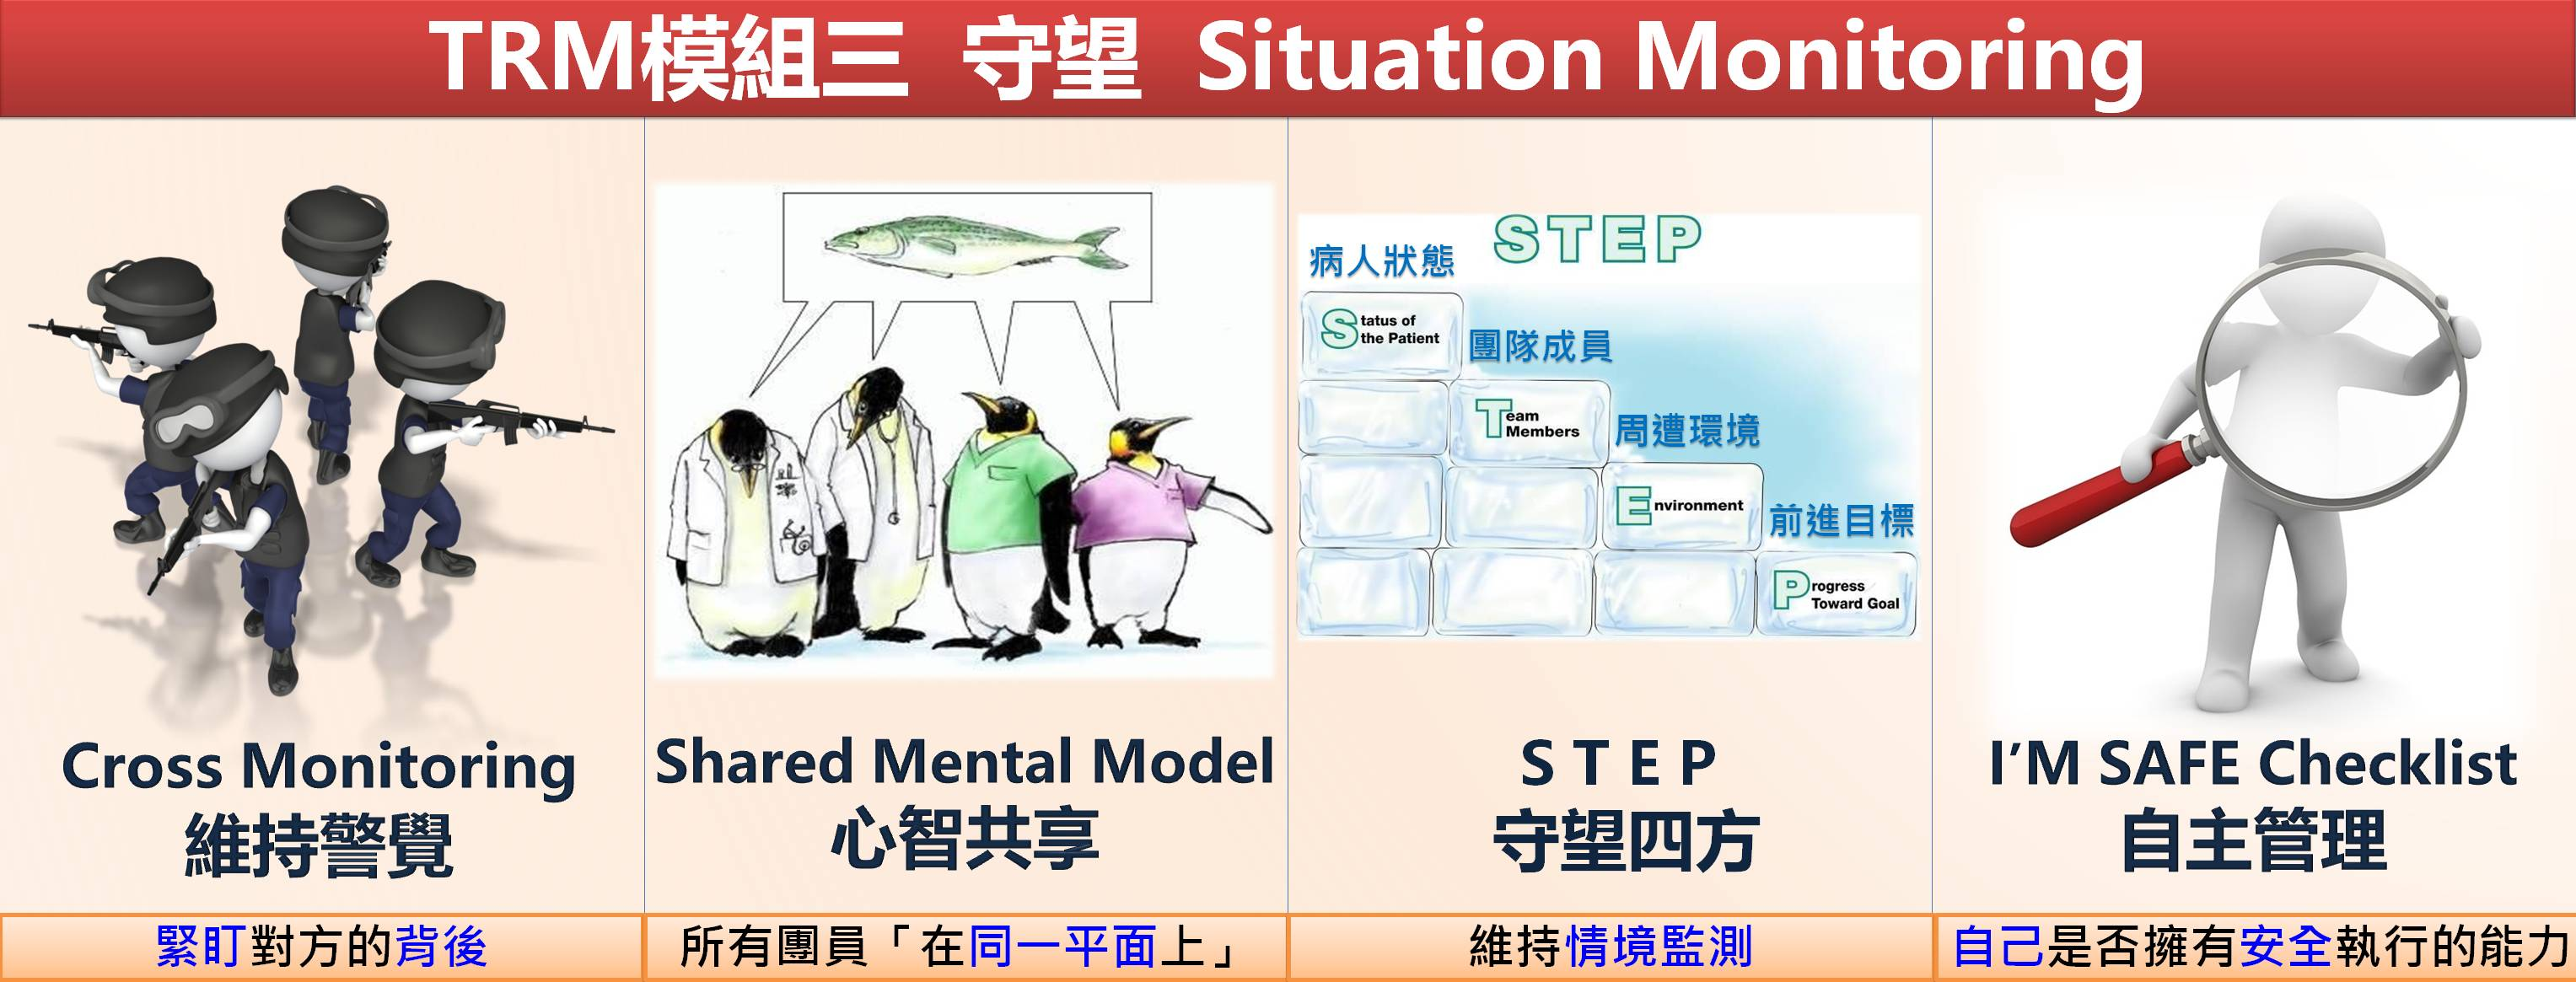 TRM模組二守望(圖片)